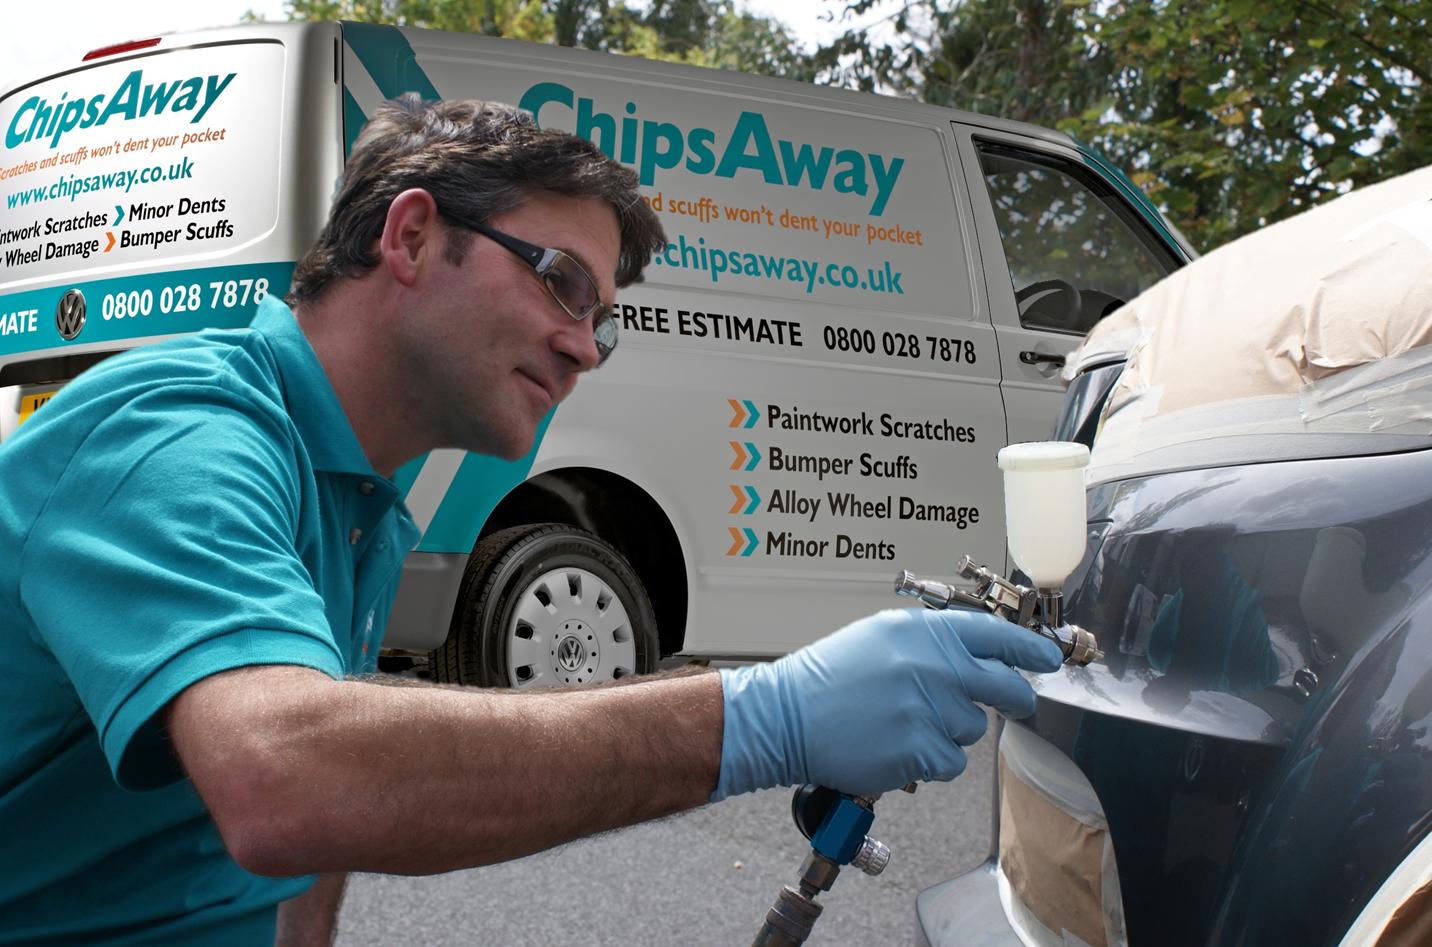 How To Use A Diy Plastic Bumper Repair Kit Chipsaway